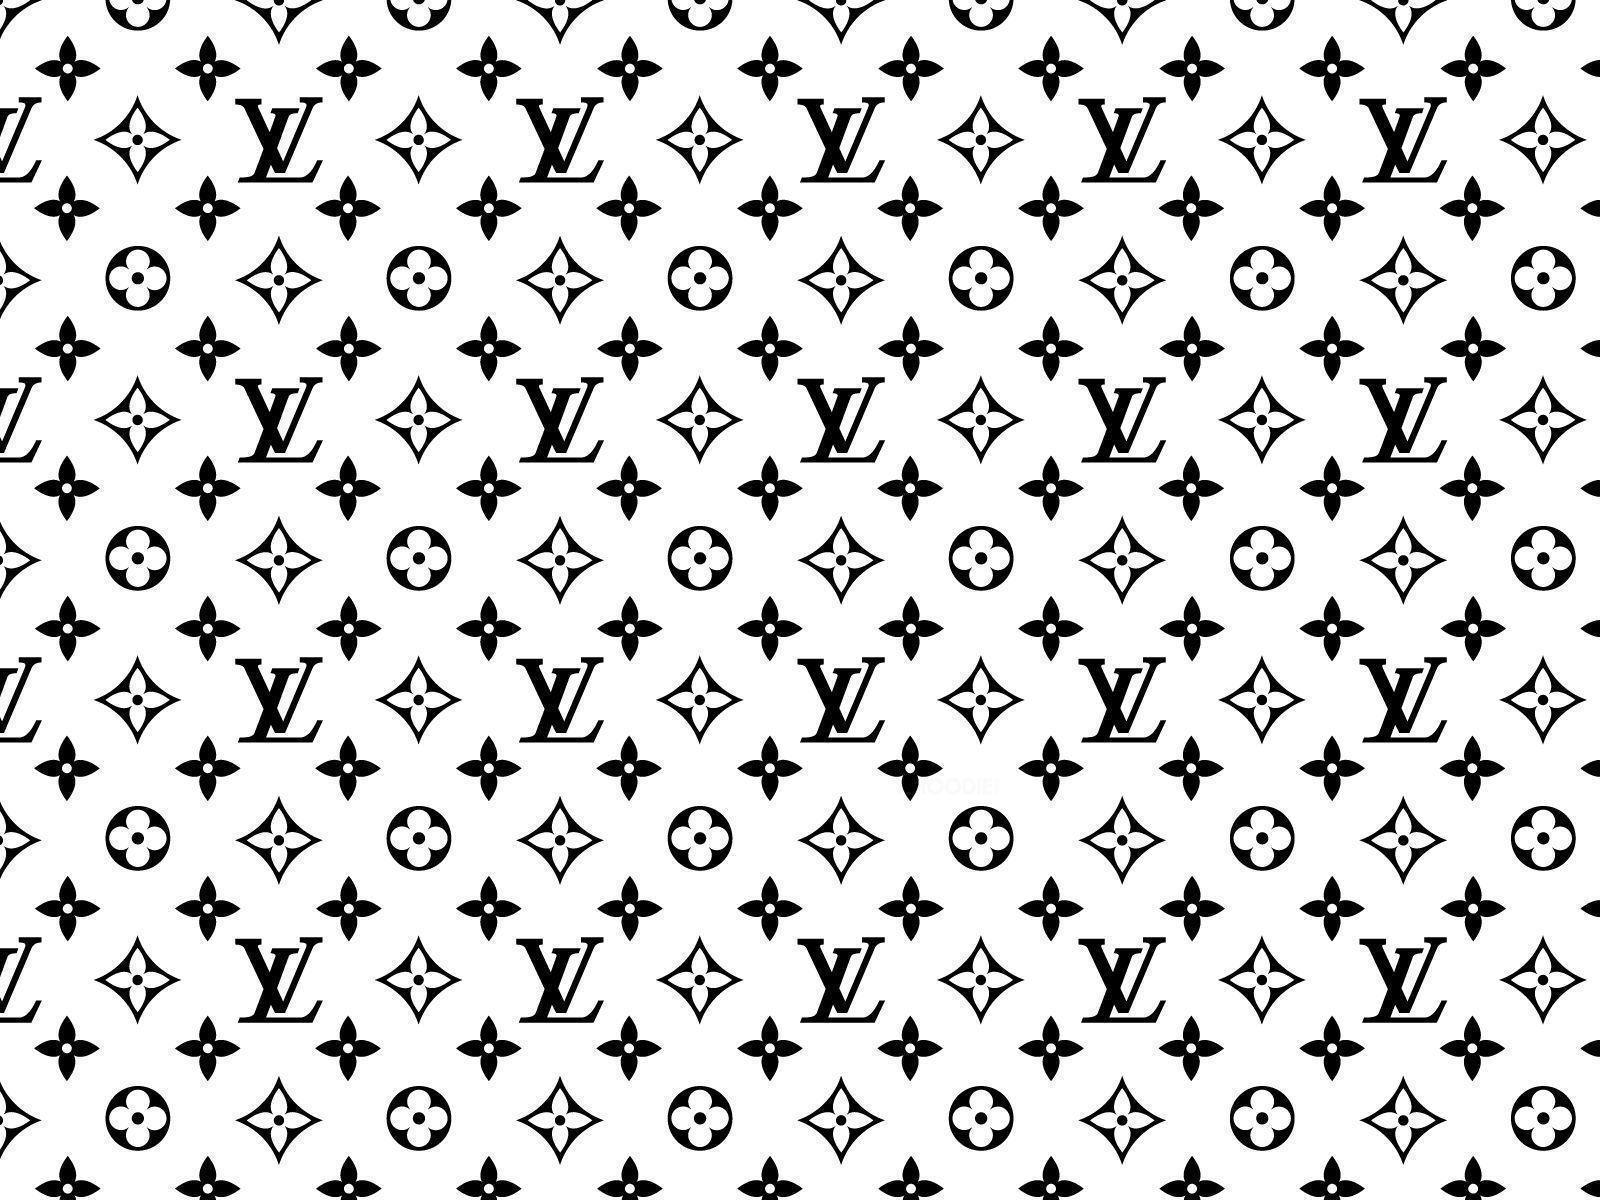 Louis Vuitton White Wallpapers - Top